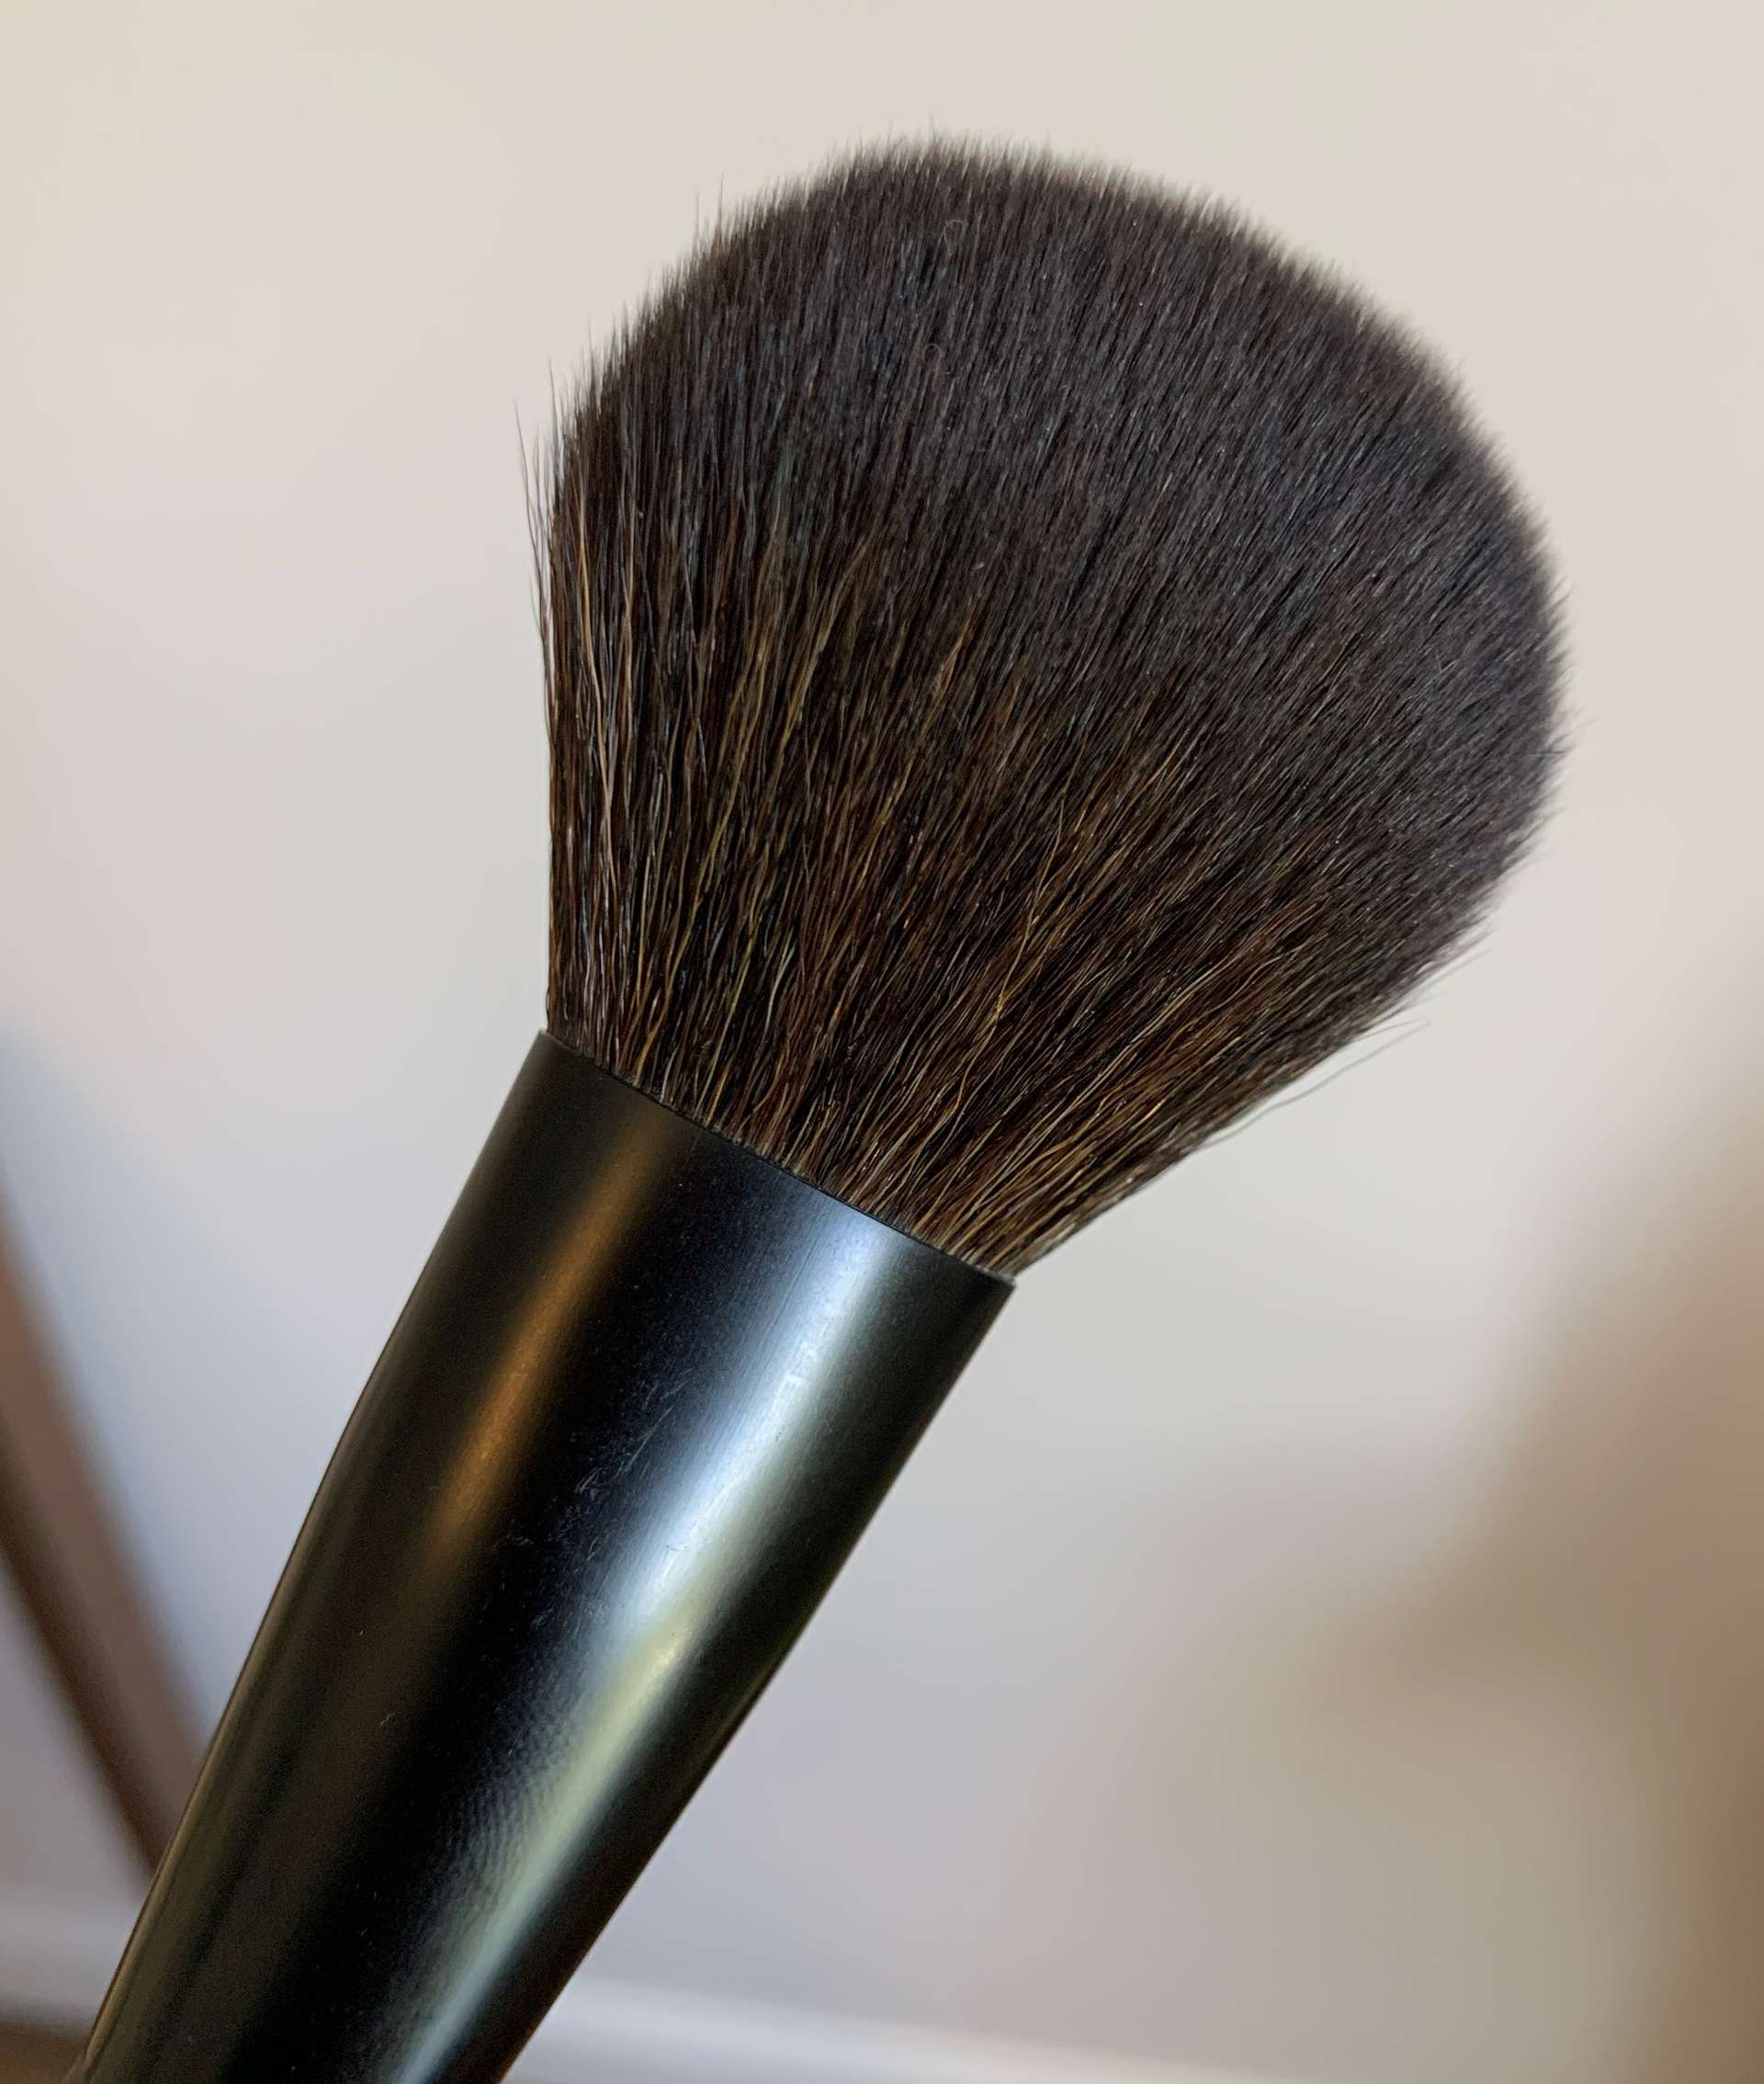 Sonia Kashuk Professional Collection medium powder brush